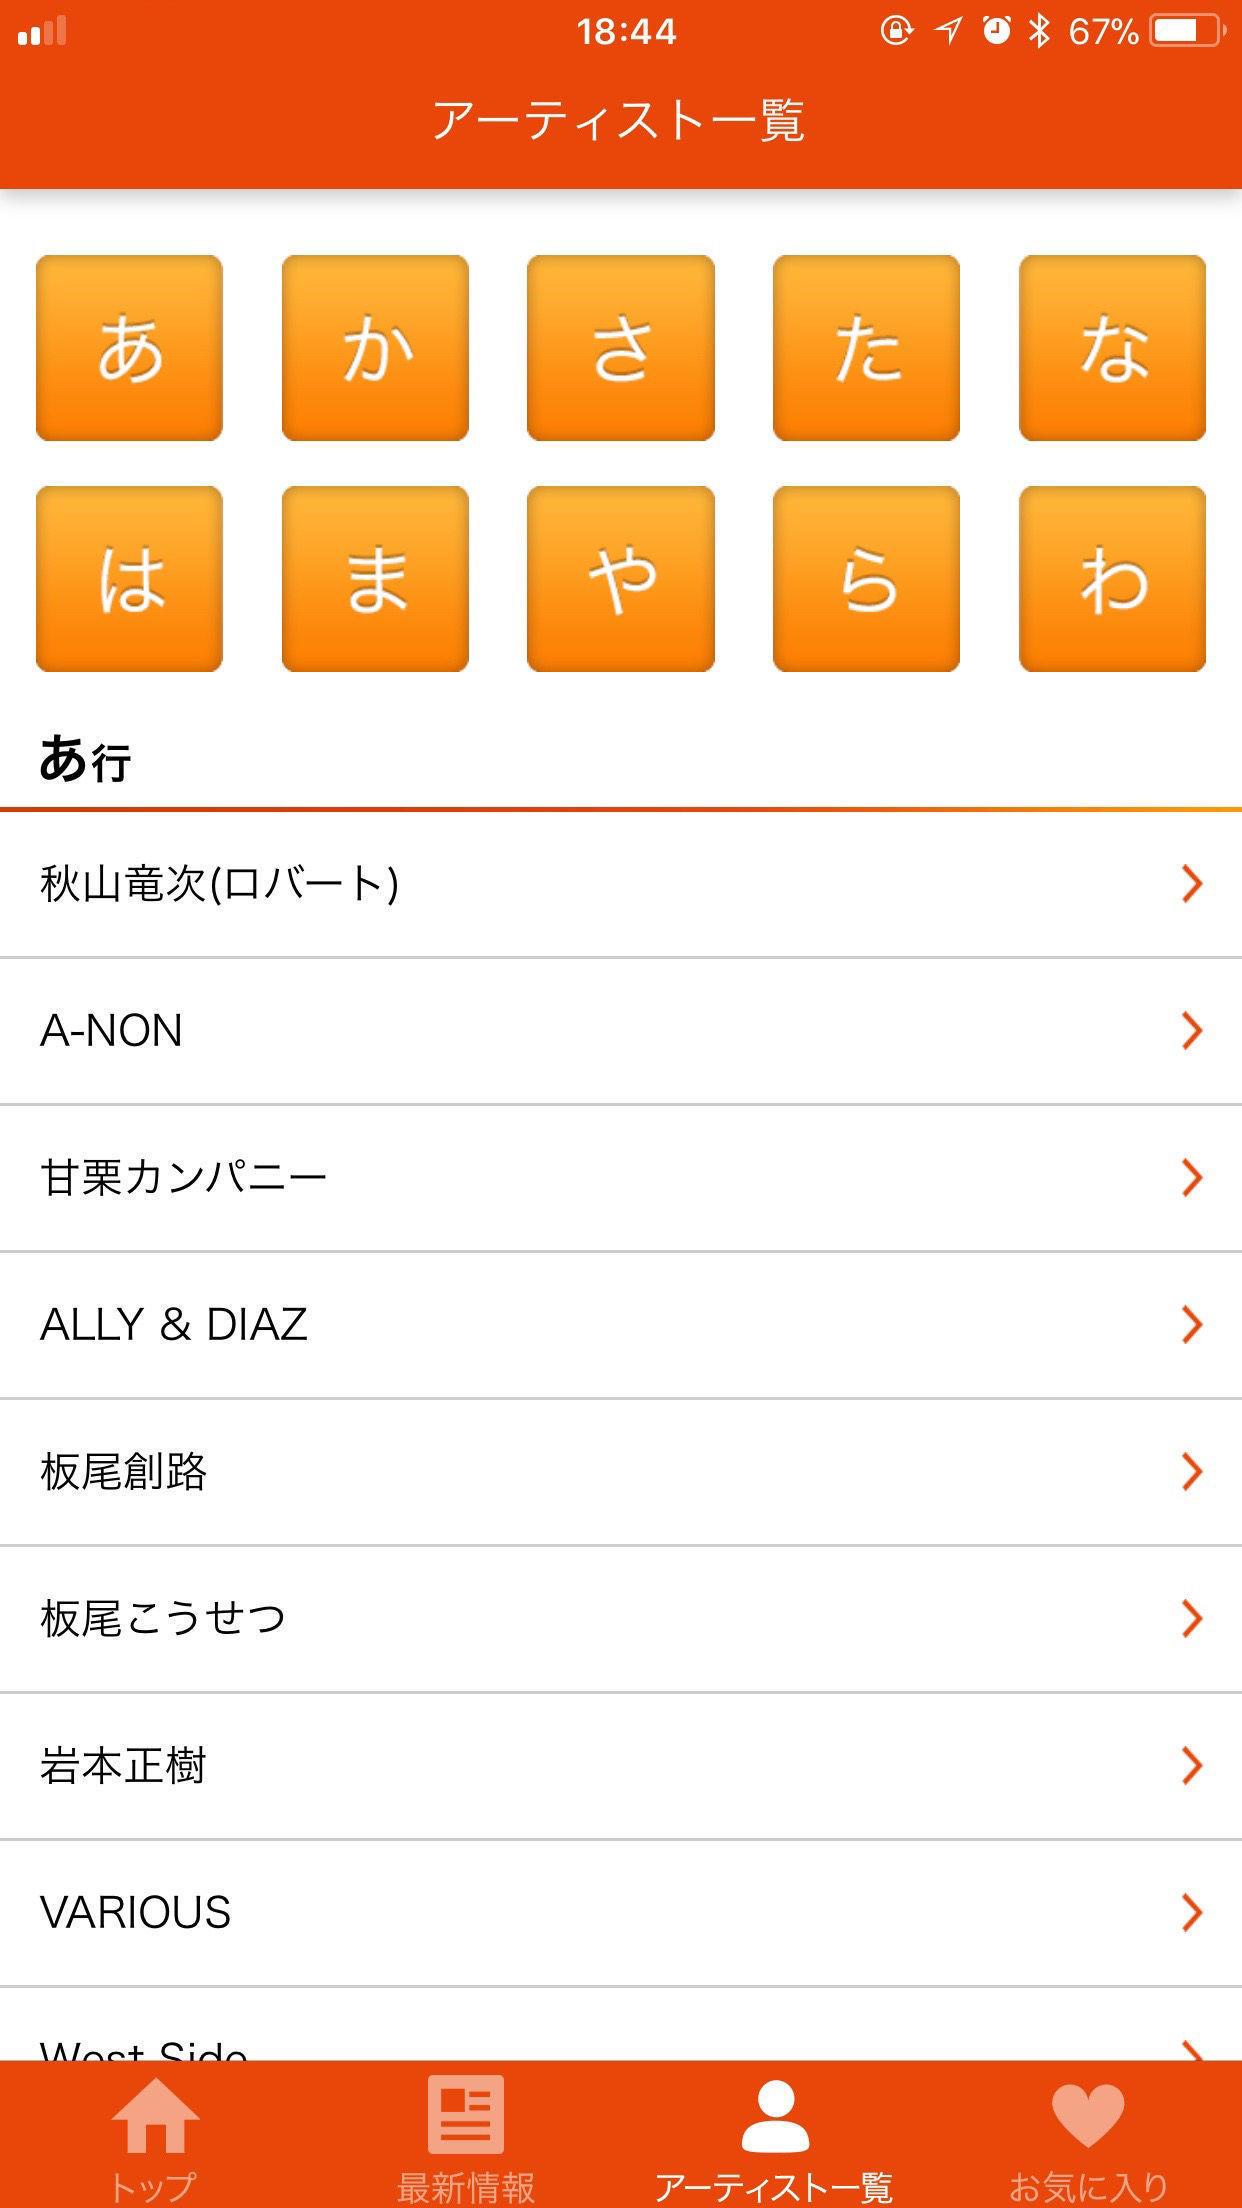 http://news.yoshimoto.co.jp/20180131161727-0b28801808ef736e1013180b73b08a71de4a8439.jpg